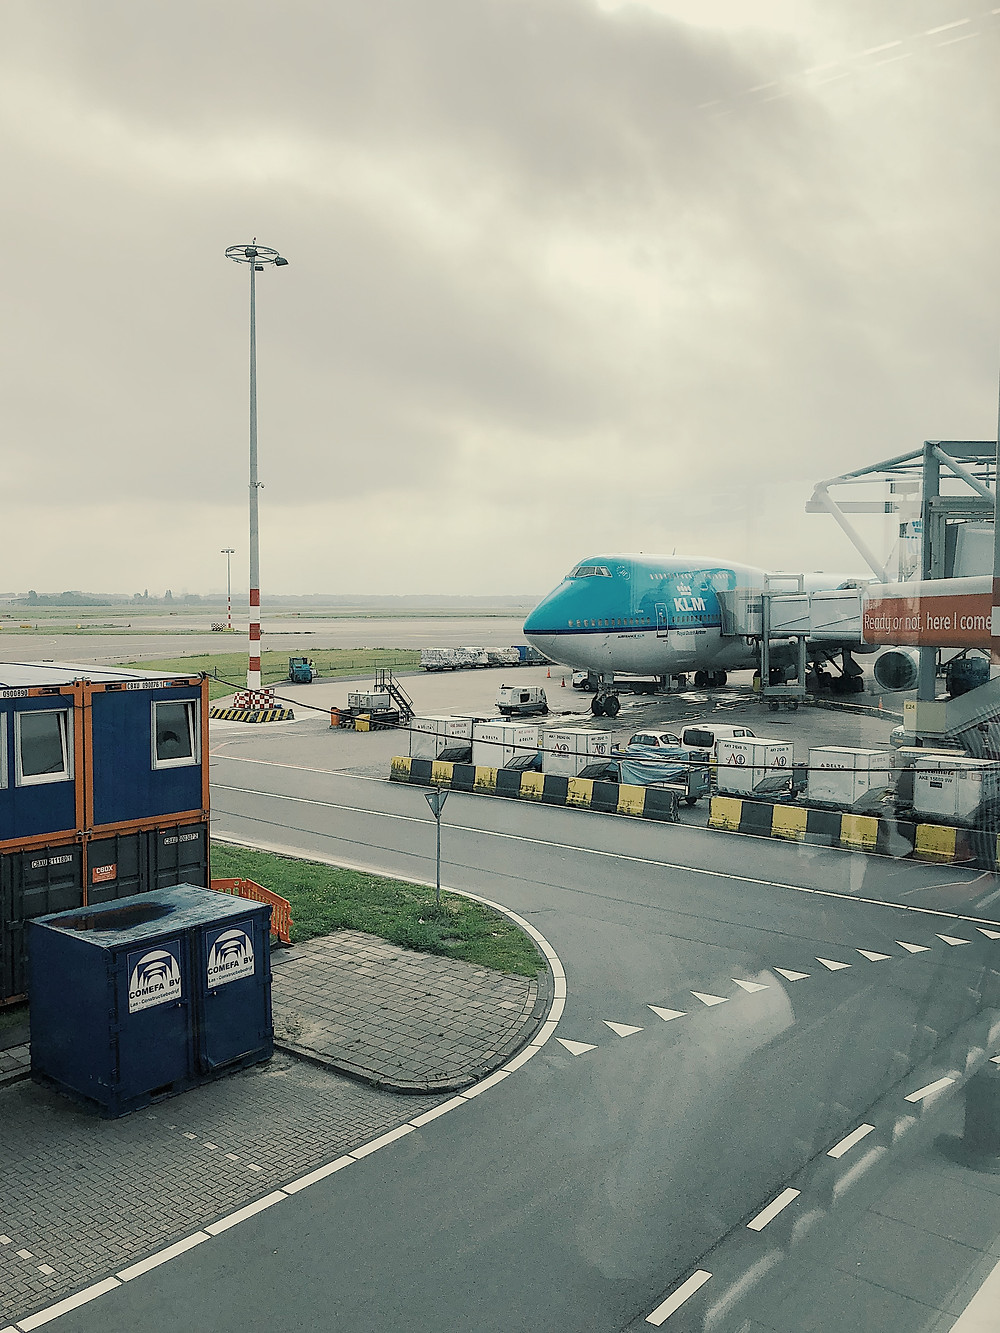 KLM Boeing 747-400ER Combi